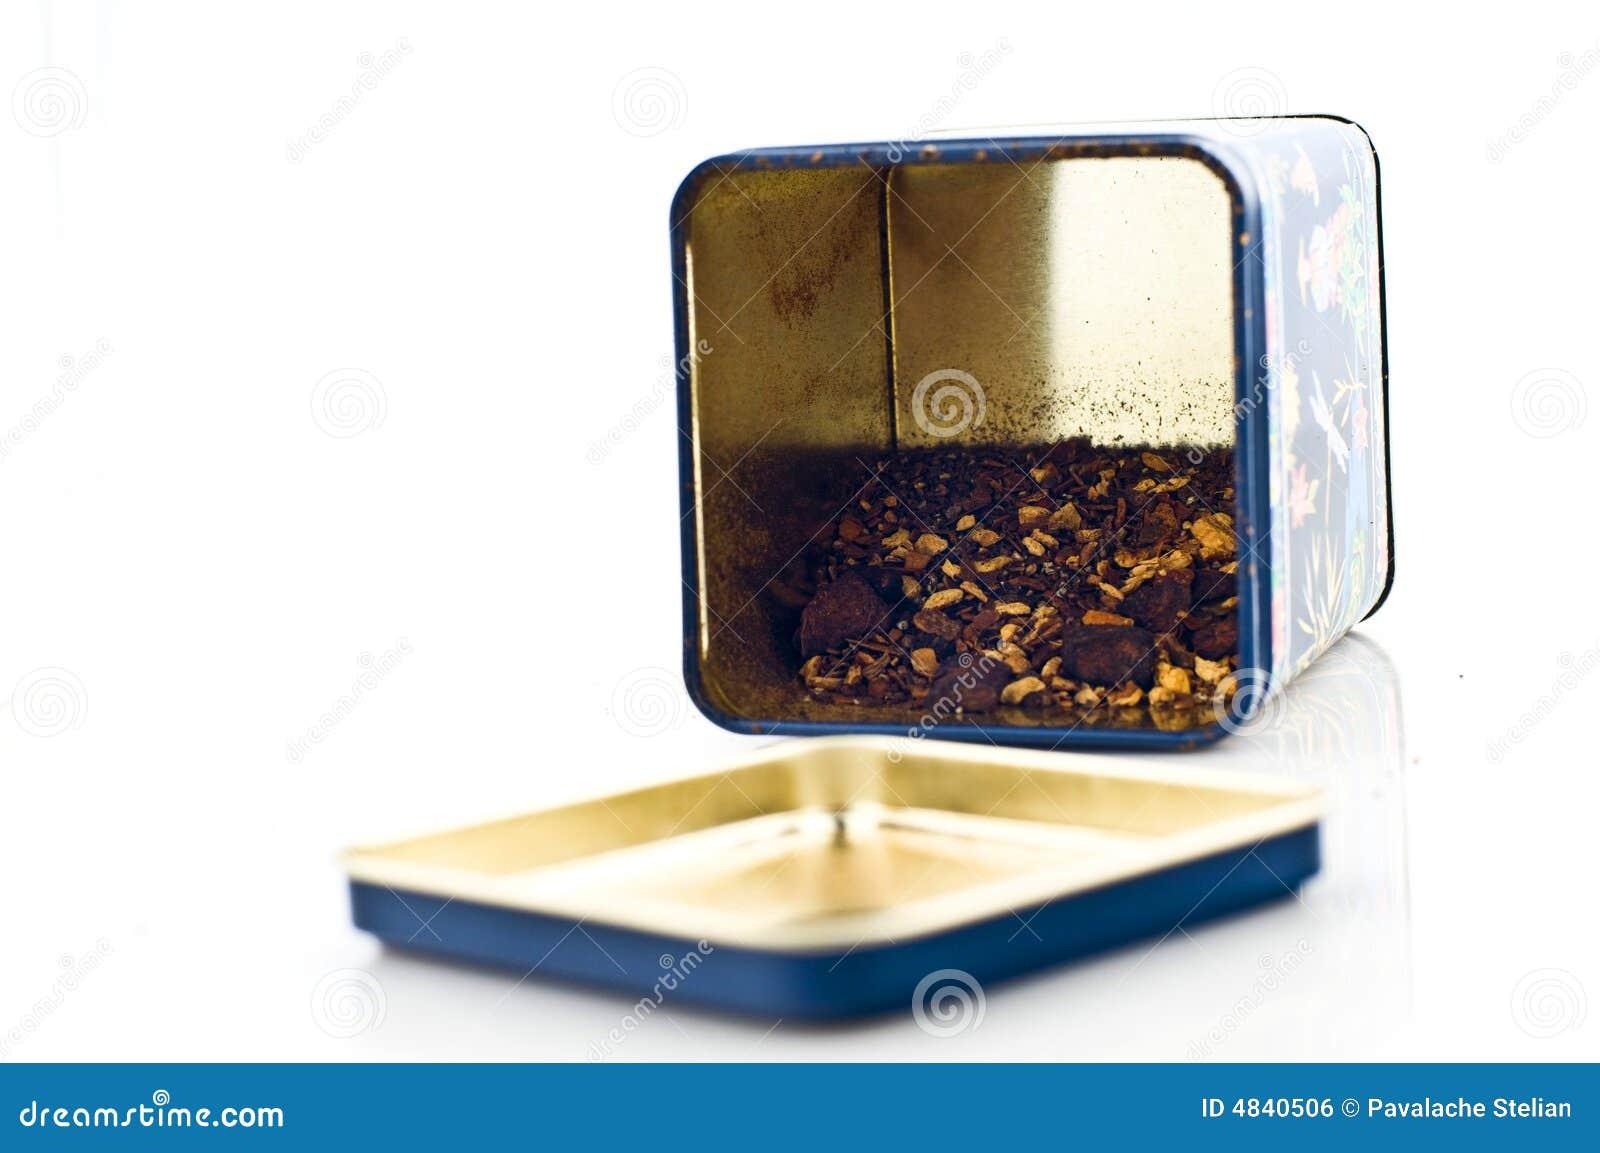 Tea box with tea